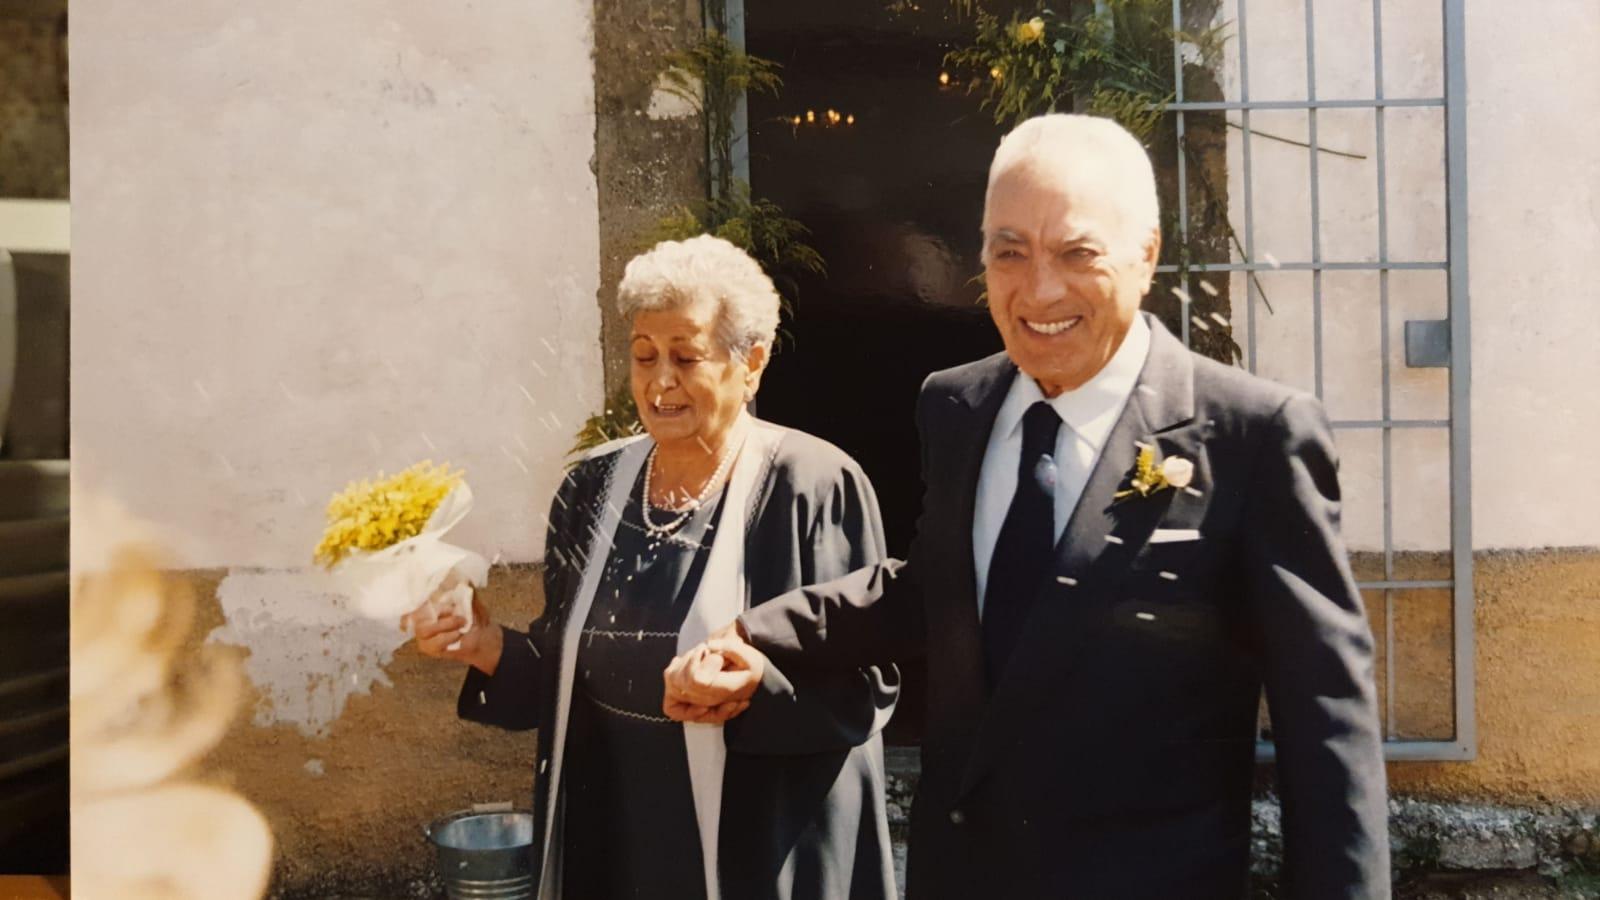 nozze d'oro | CErrone Nozze wedding boutique